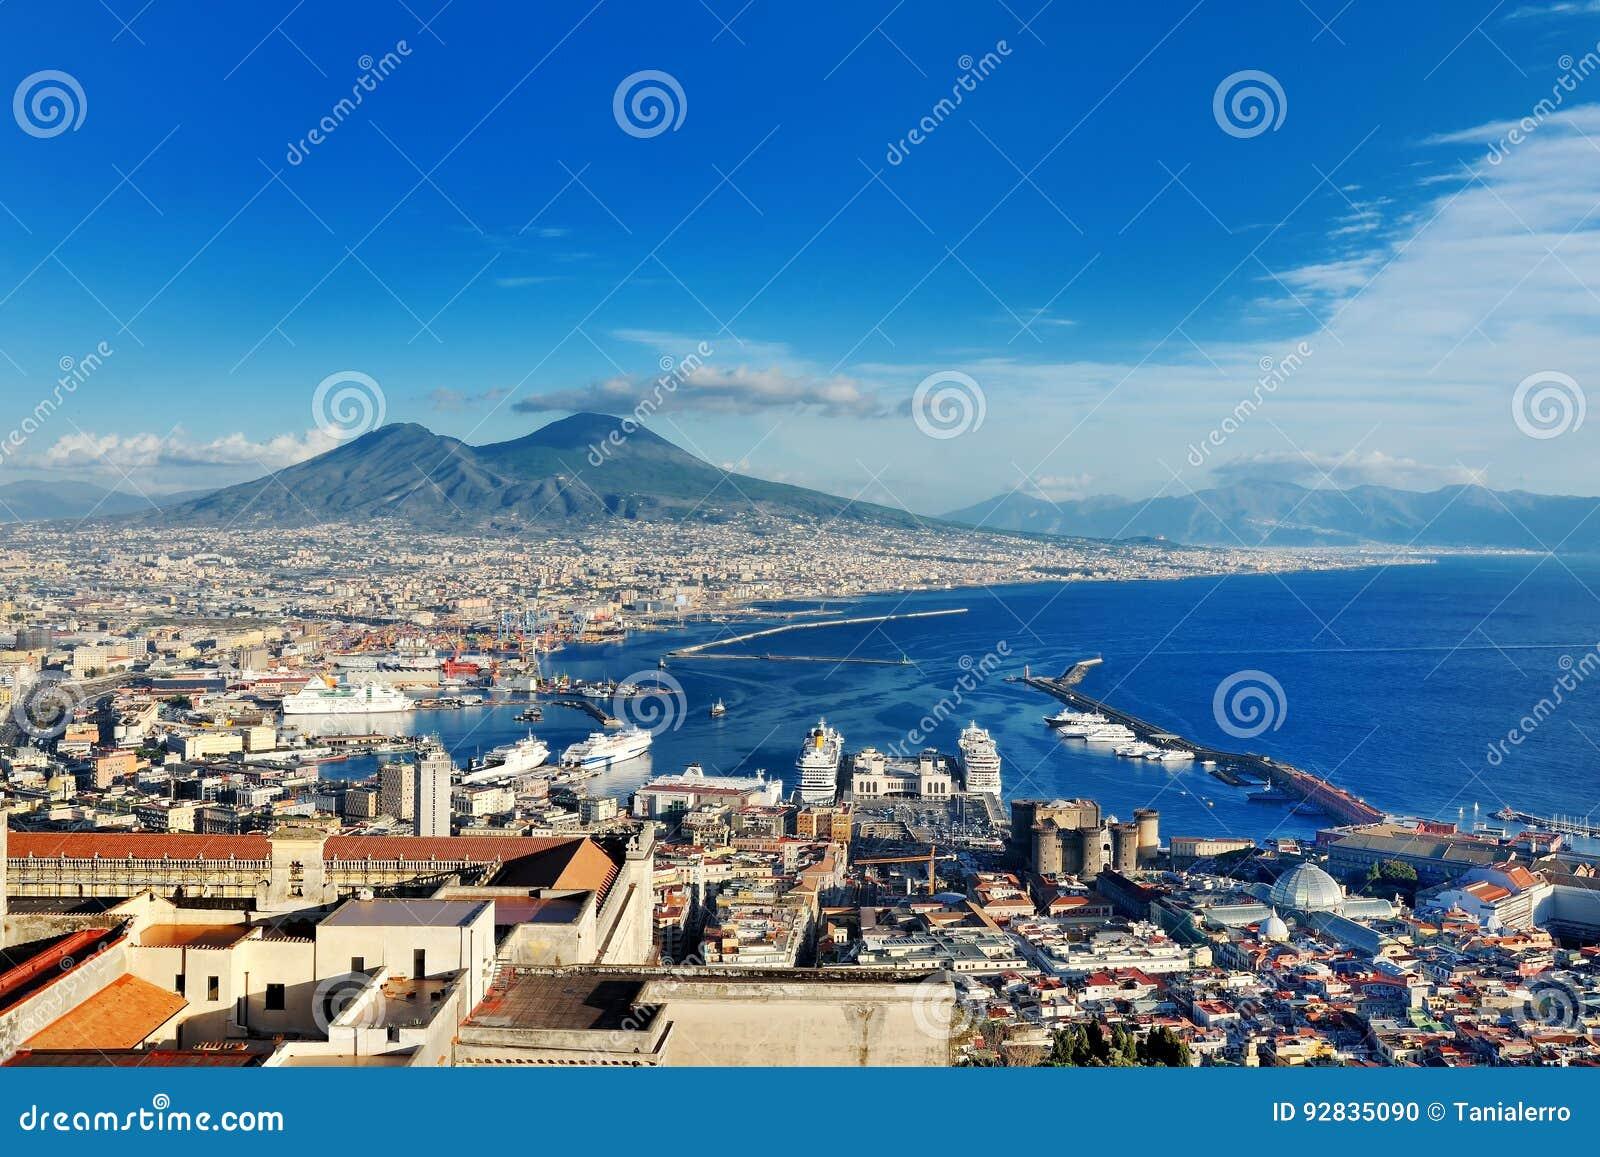 Naples, Włochy, Europa - panoramiczny widok Vesuvius wulkan i zatoka